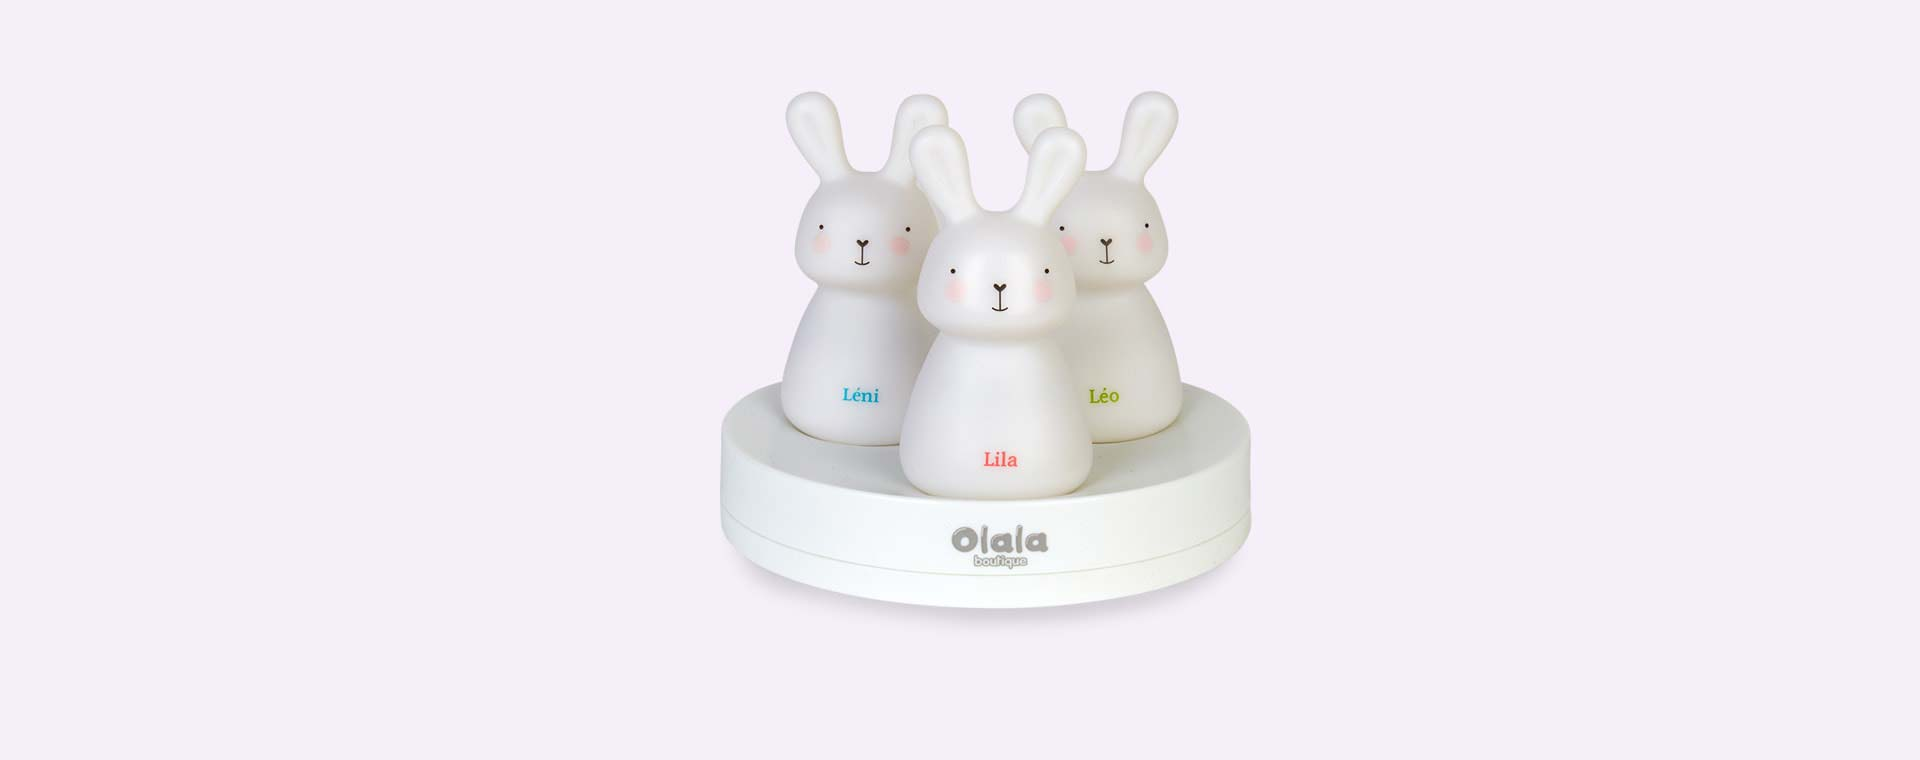 White Olala Boutique Night Lights